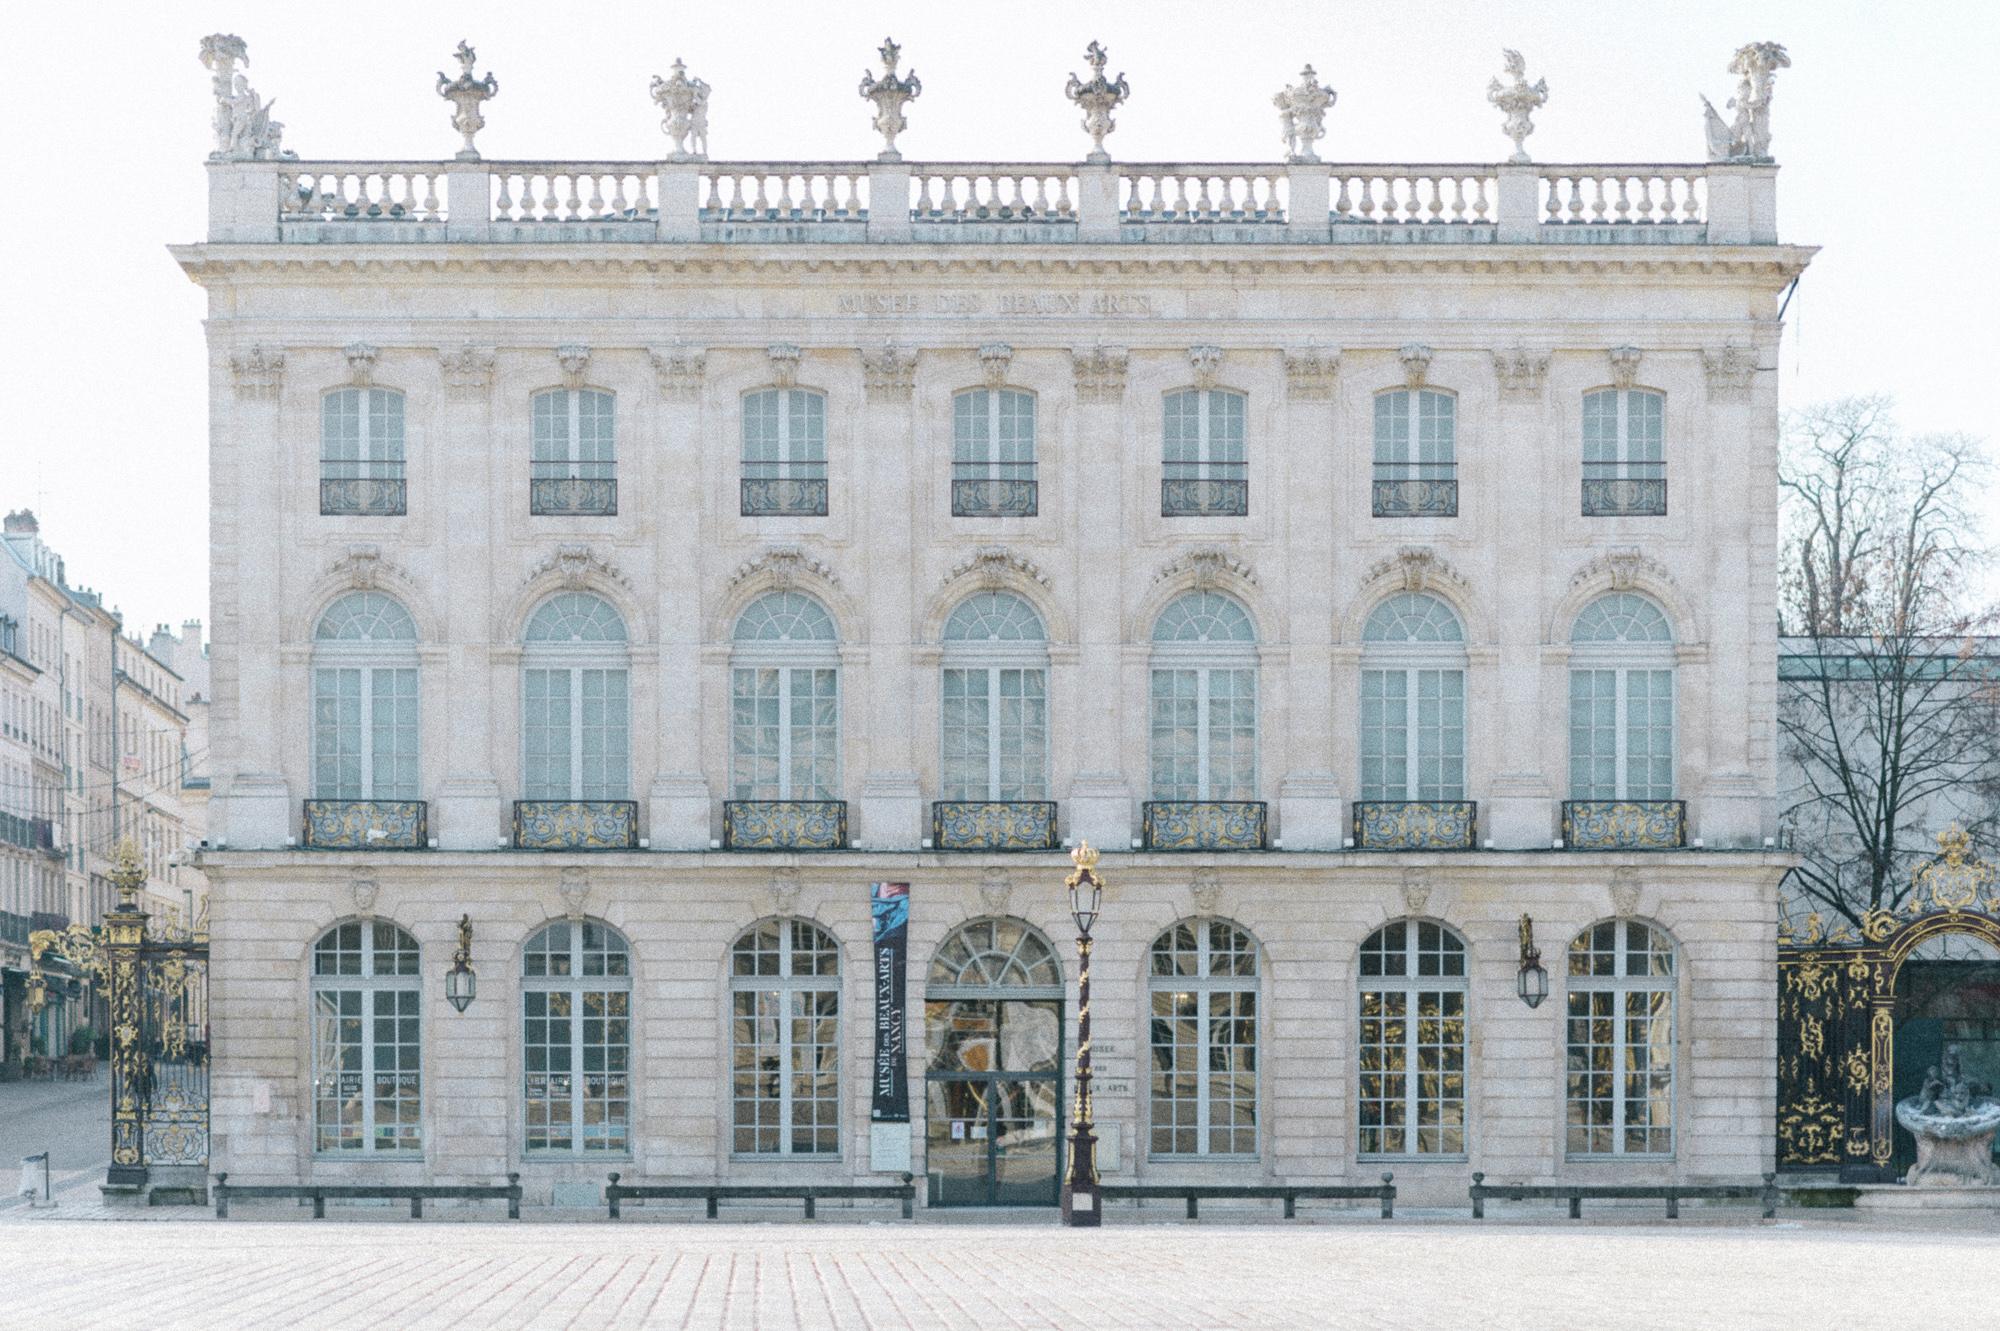 Nancy_France_2019_16.jpg